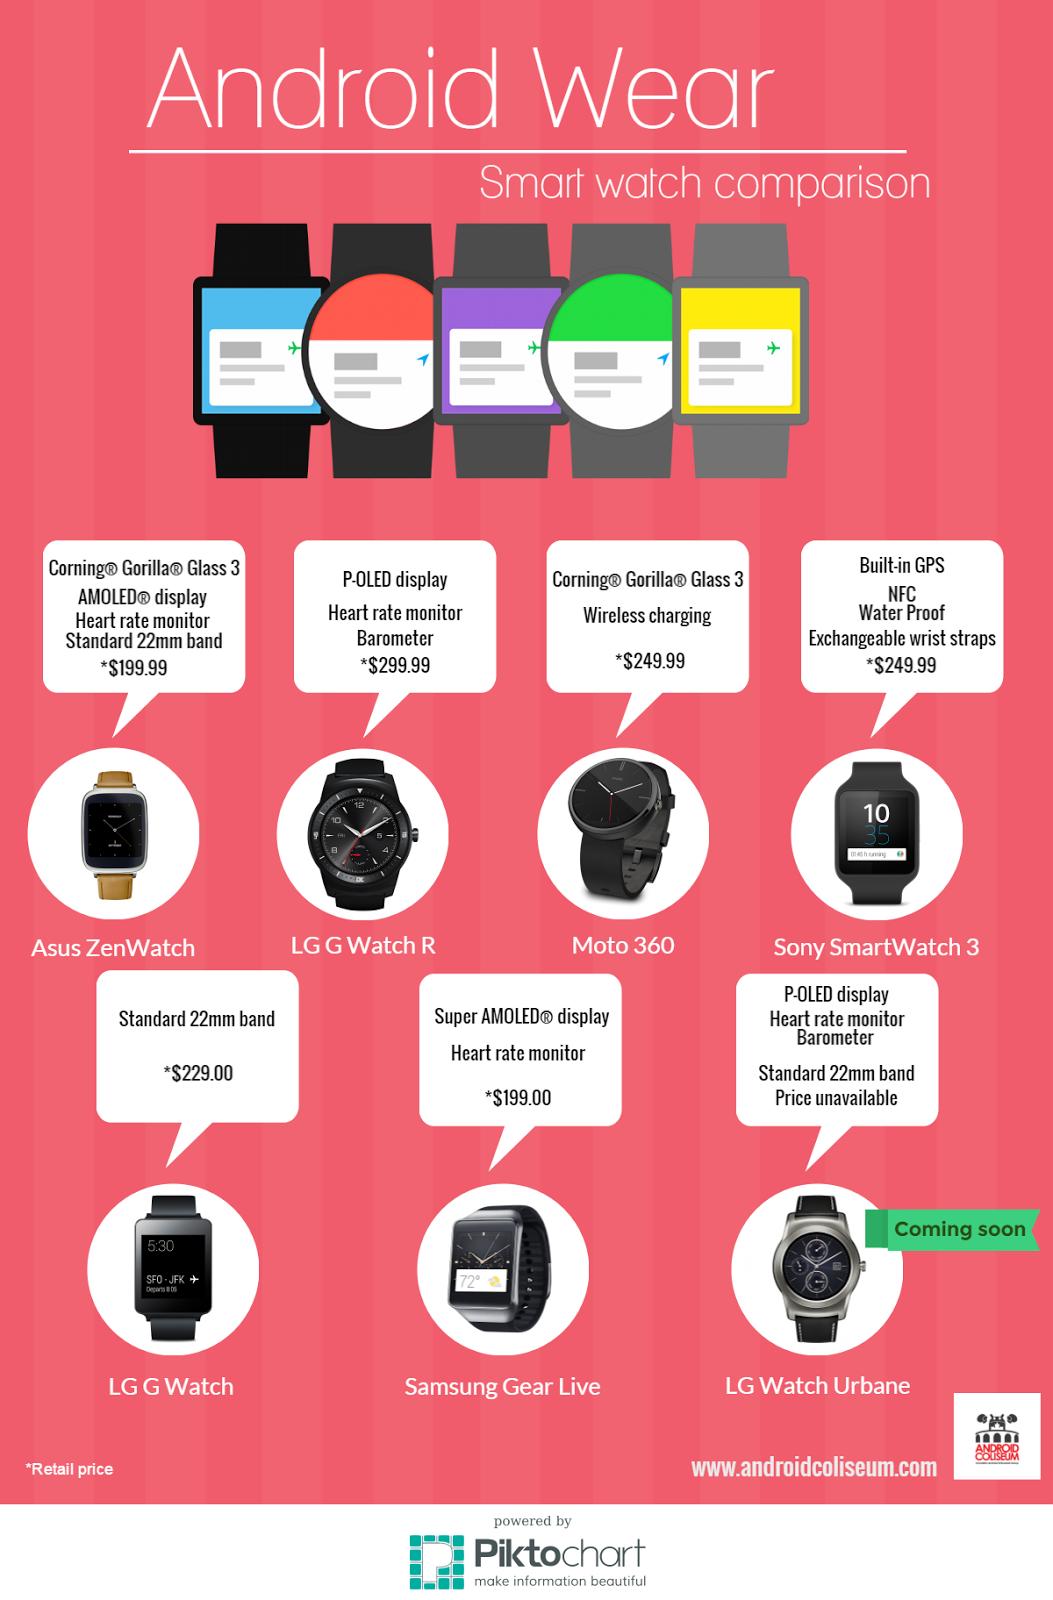 Infographic theme ideas